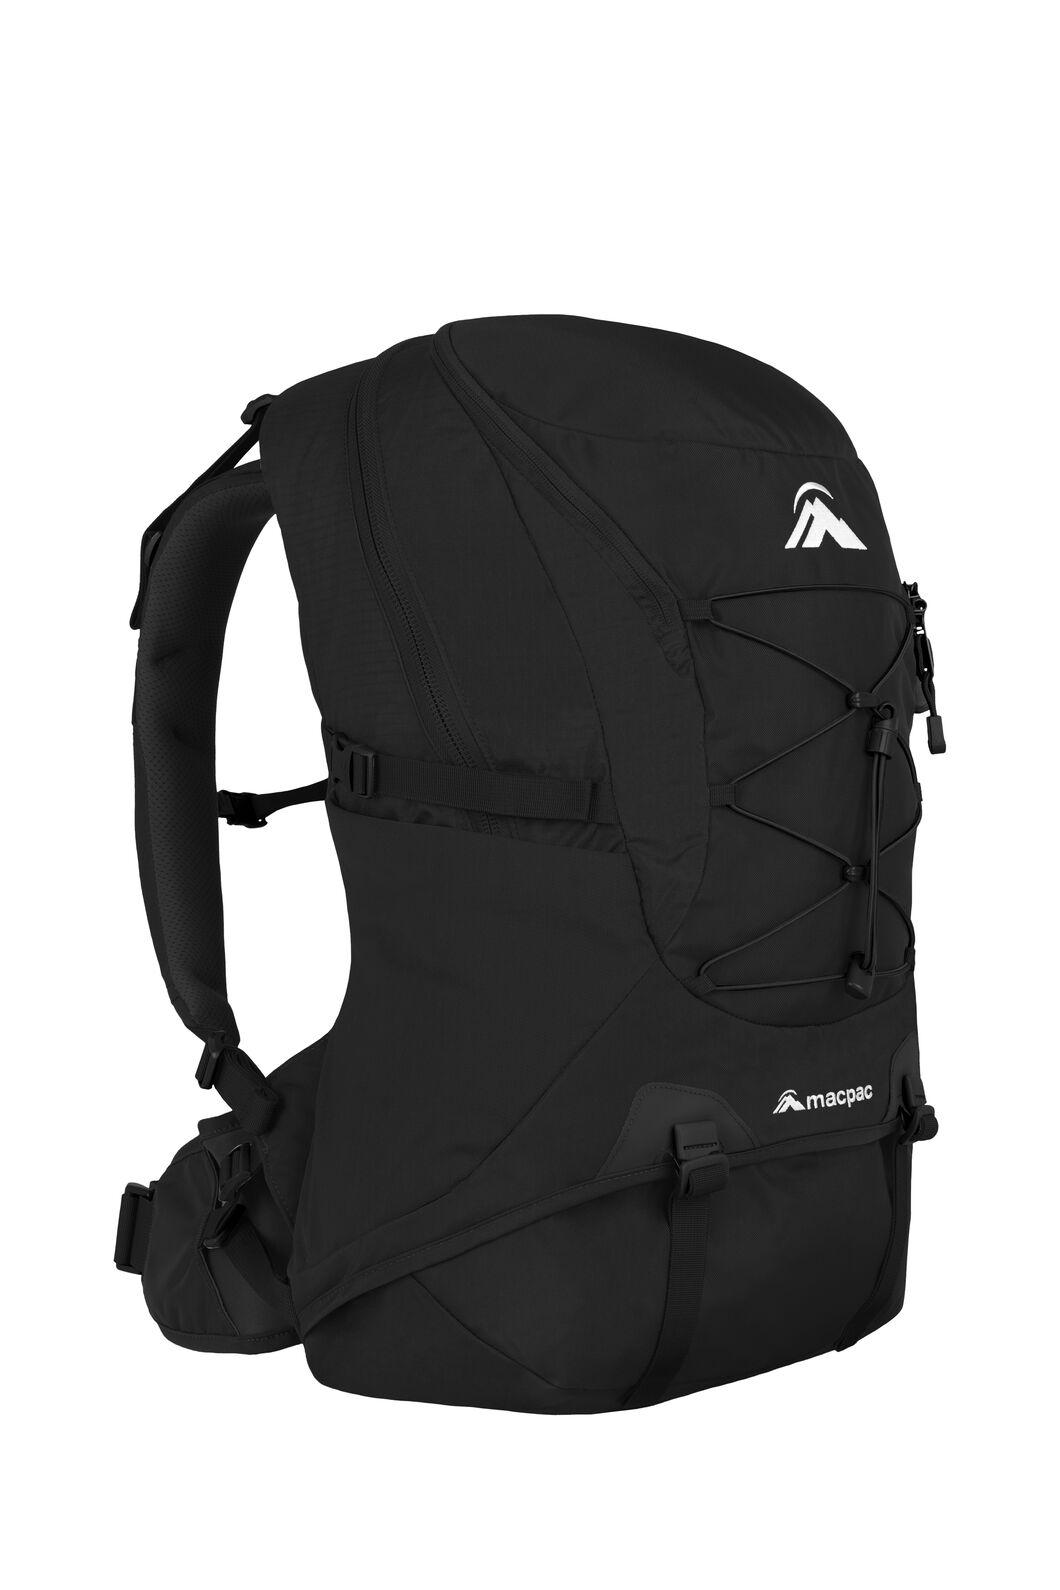 Macpac Voyager 35L Pack, Black, hi-res